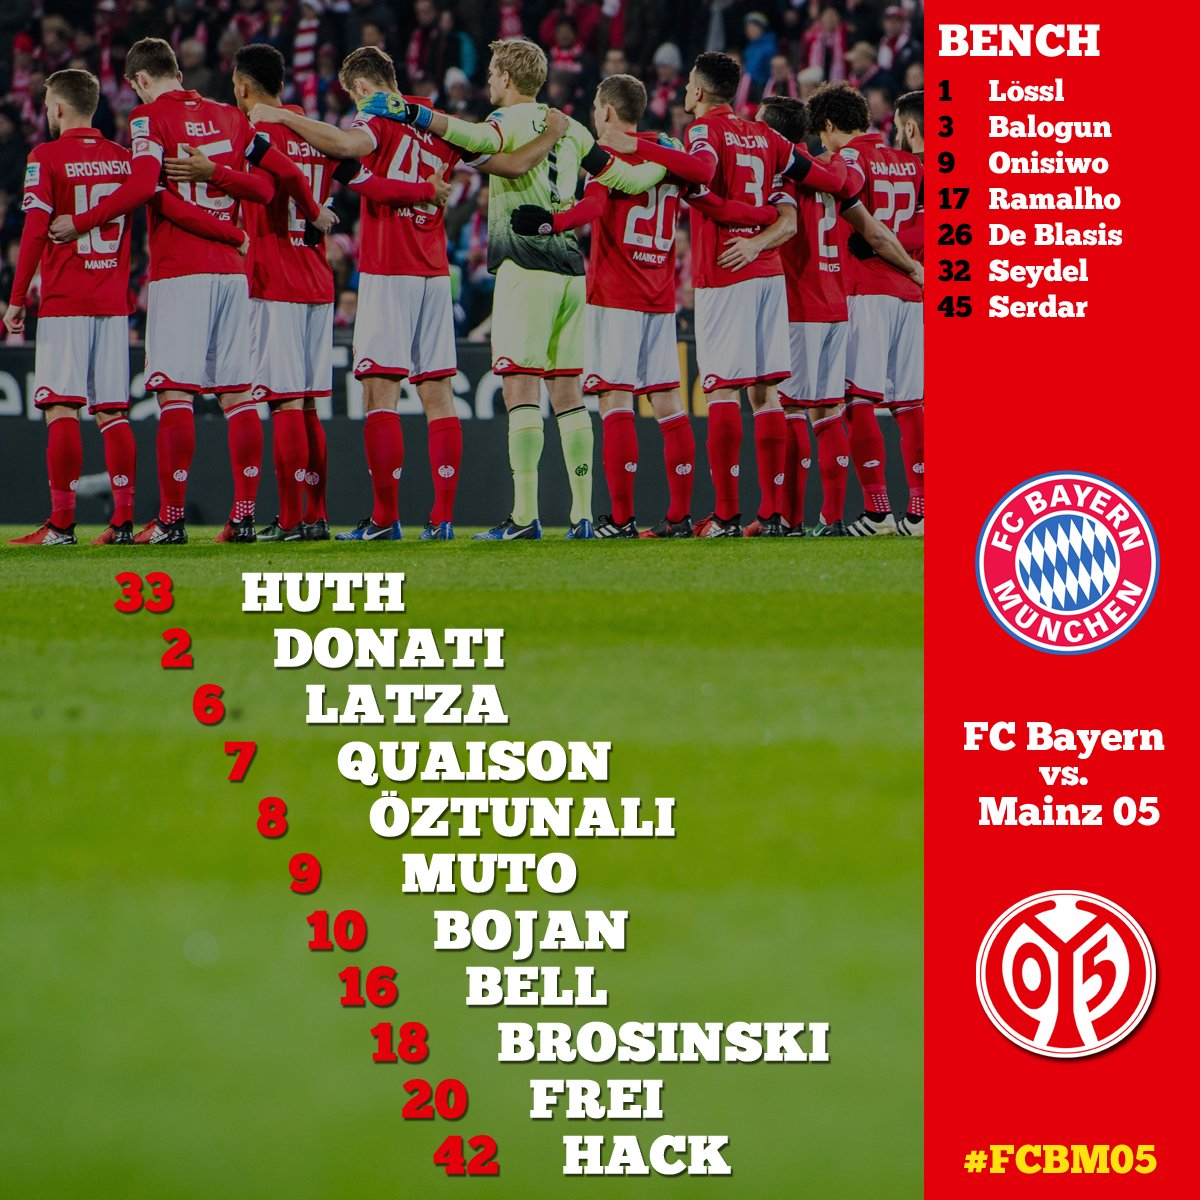 Mainz 05 English on Twitter: